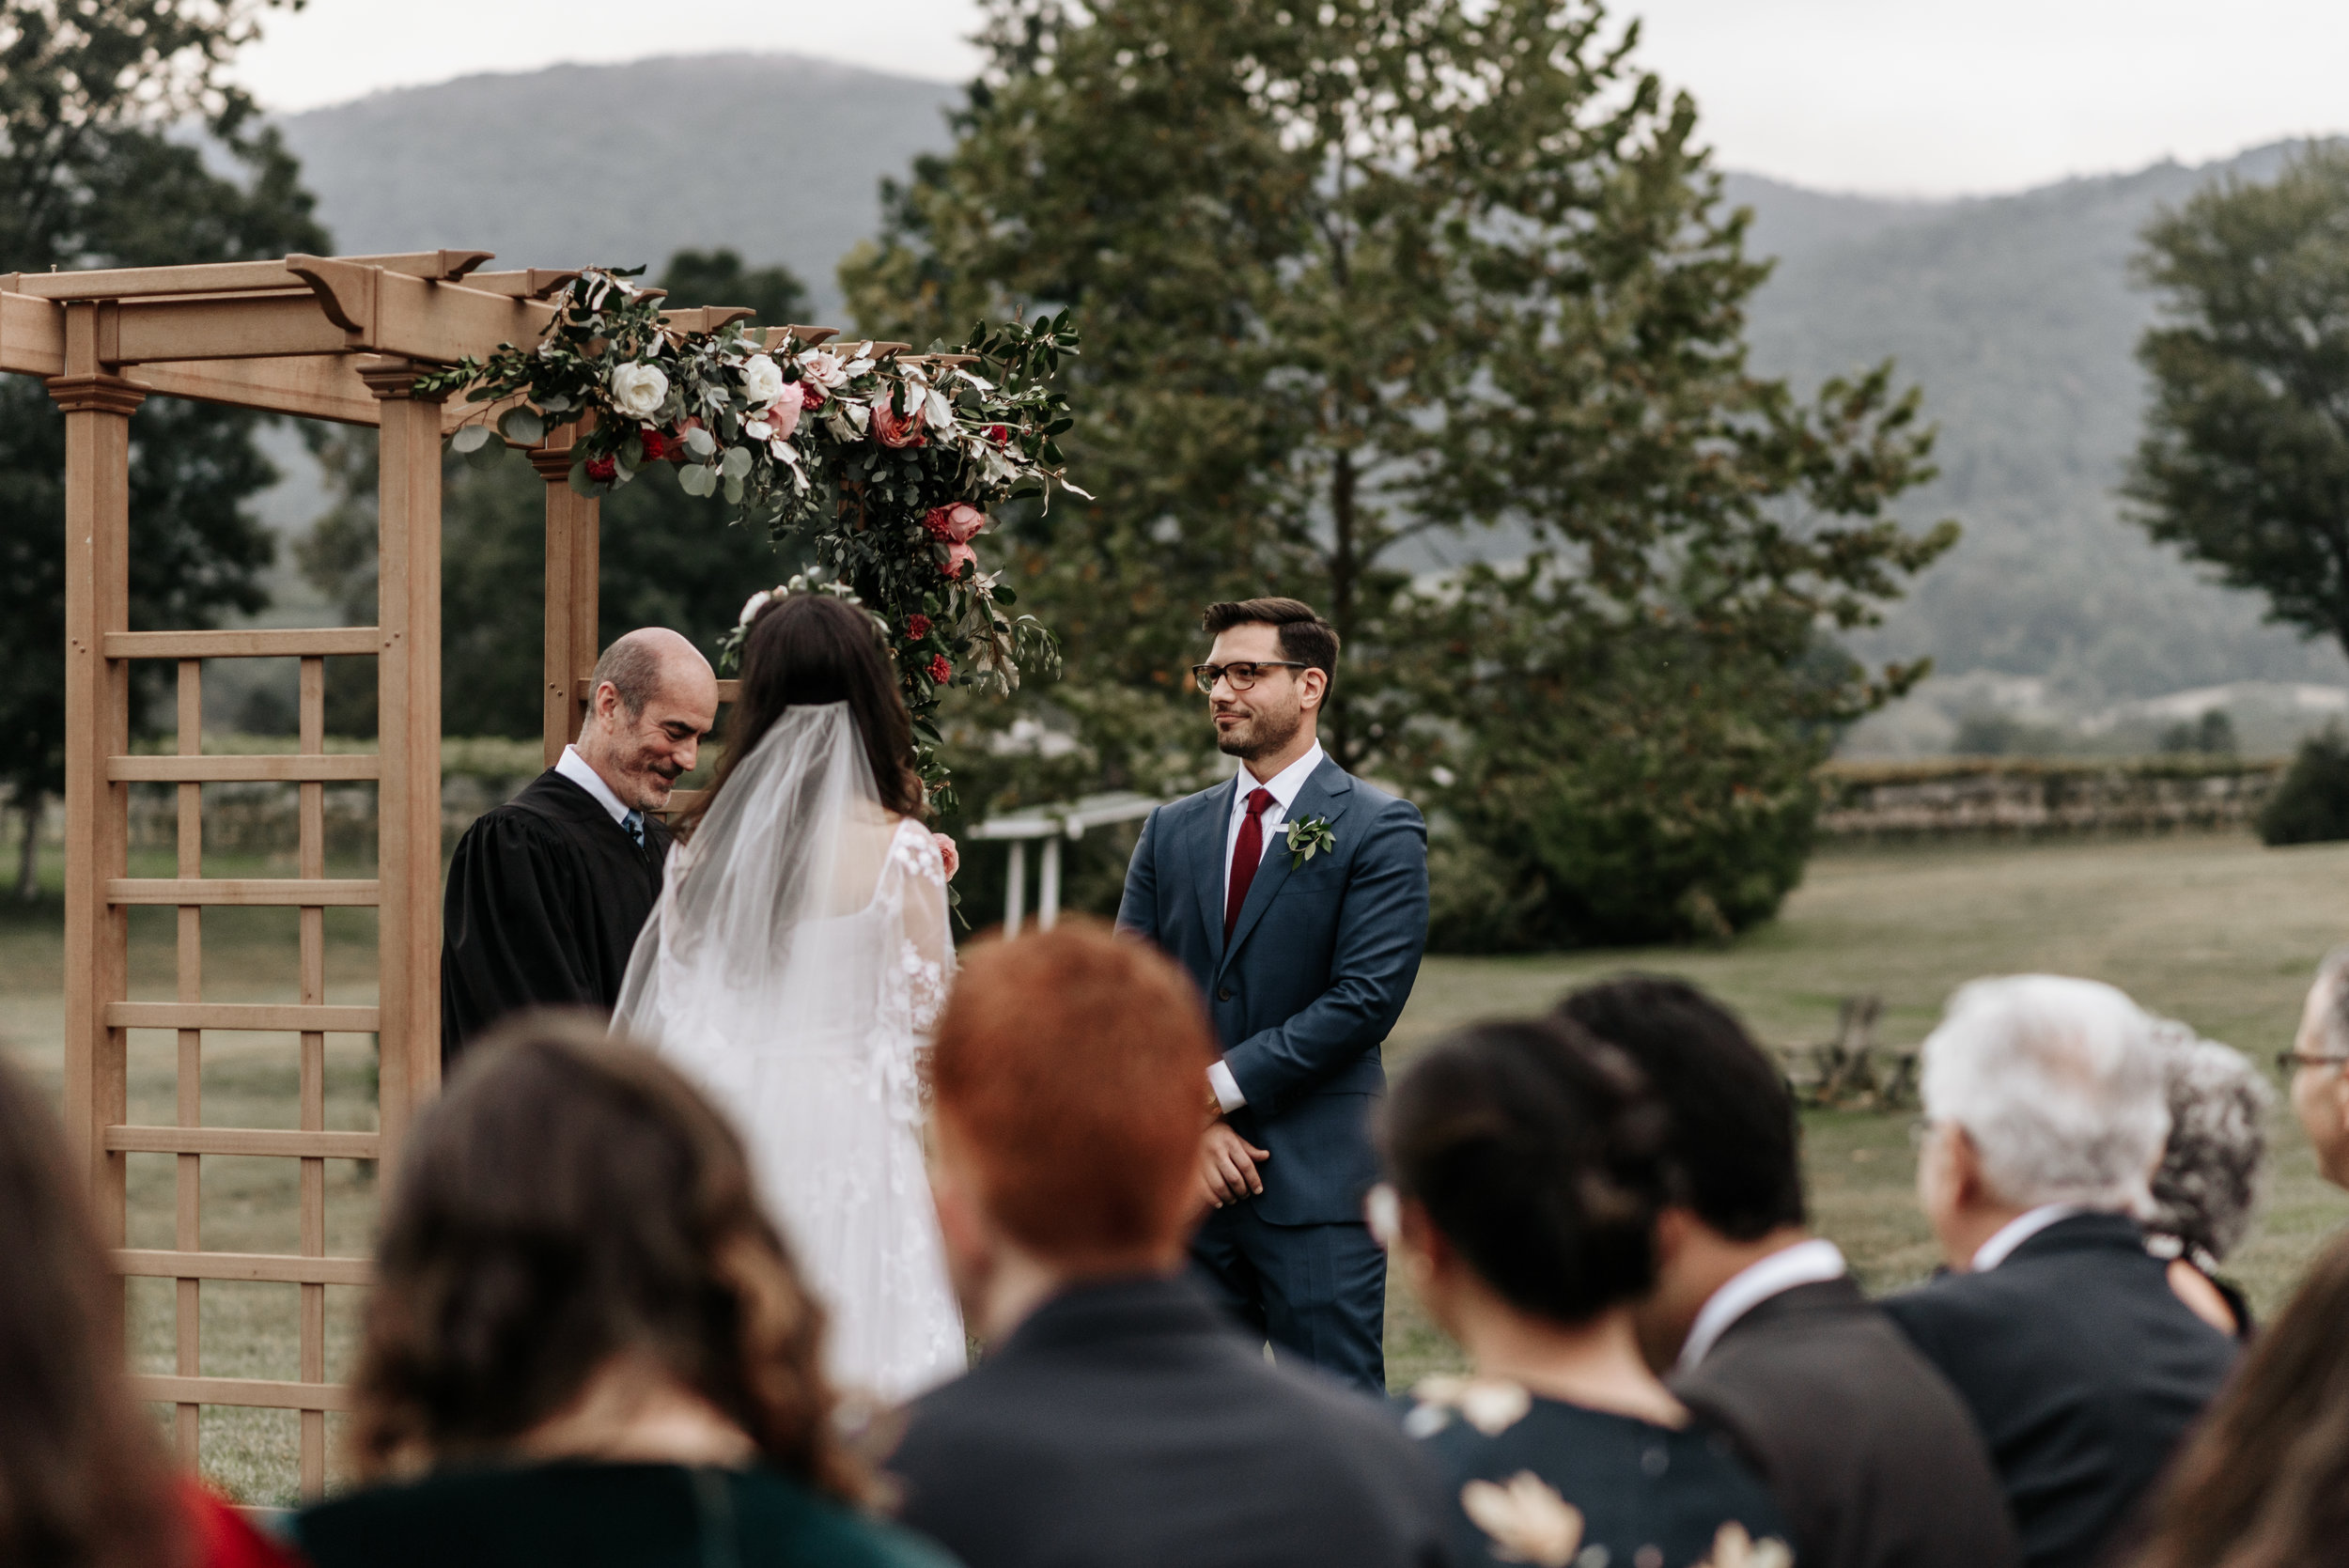 Veritas-Vineyards-and-Winery-Wedding-Photography-Afton-Virginia-Yasmin-Seth-Photography-by-V-2811.jpg